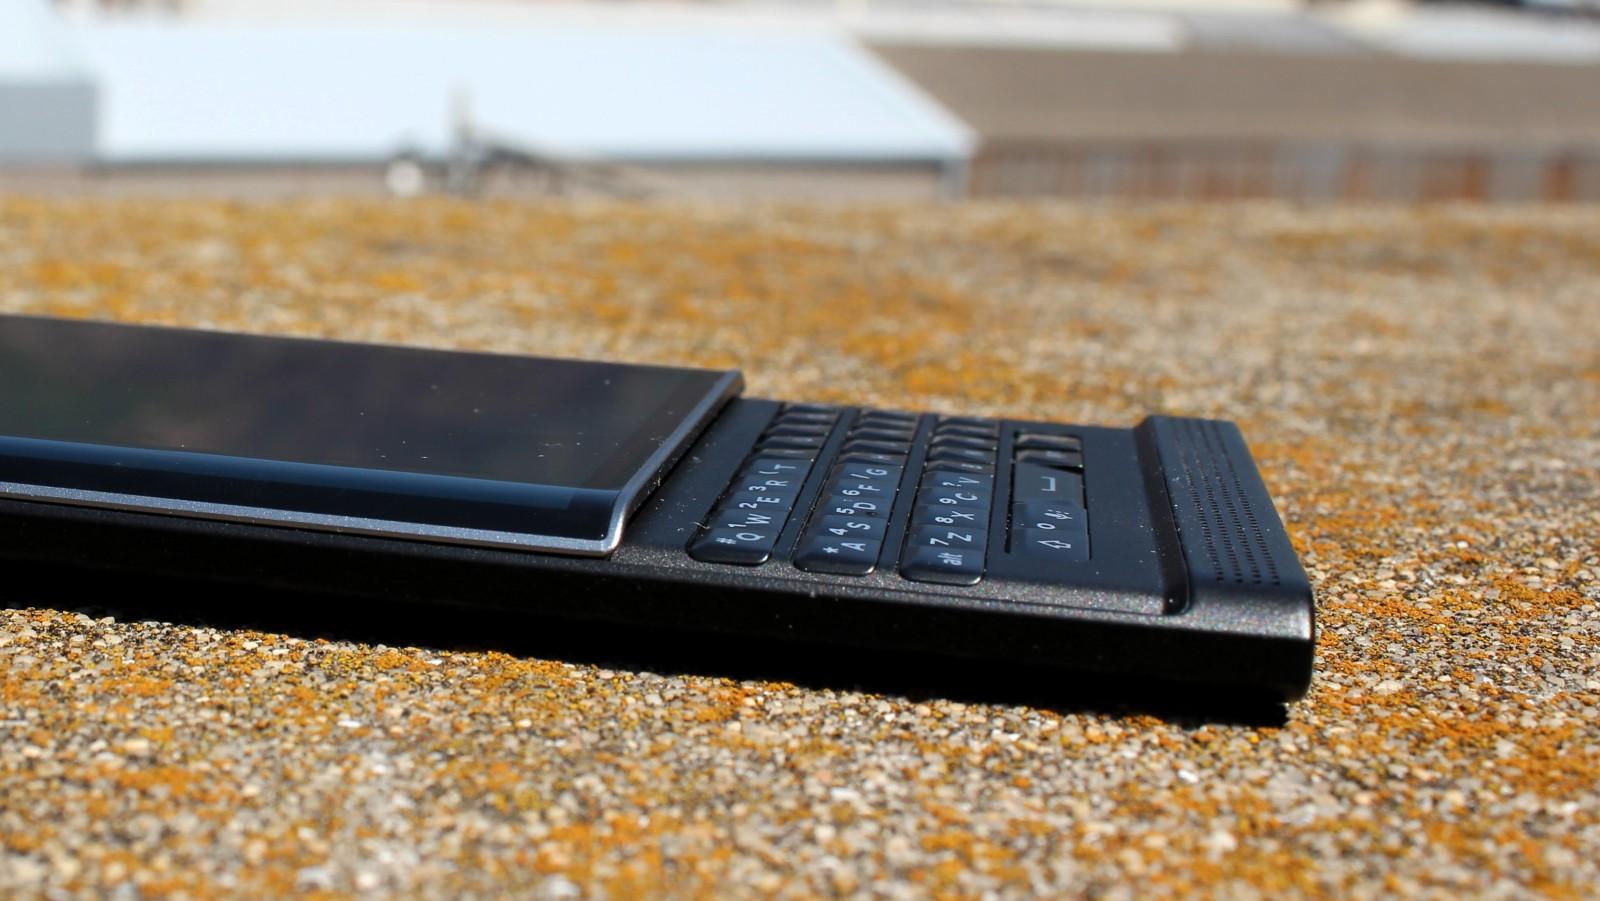 BlackBerry PRIV review 3